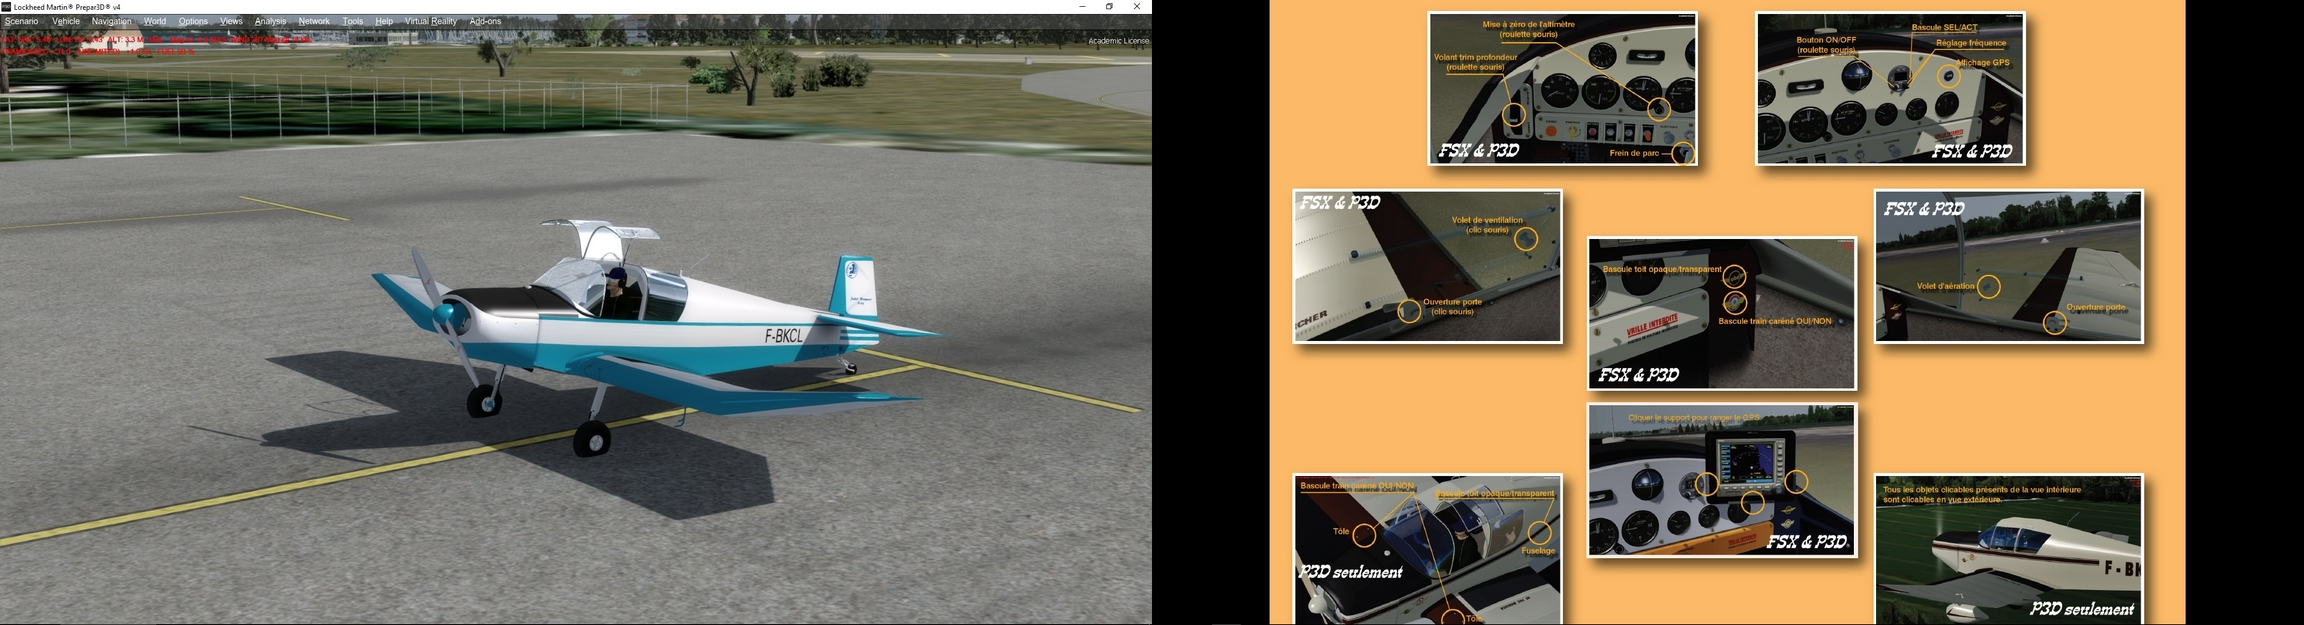 http://www.pilote-virtuel.com/img/gallery/1517065176.jpg